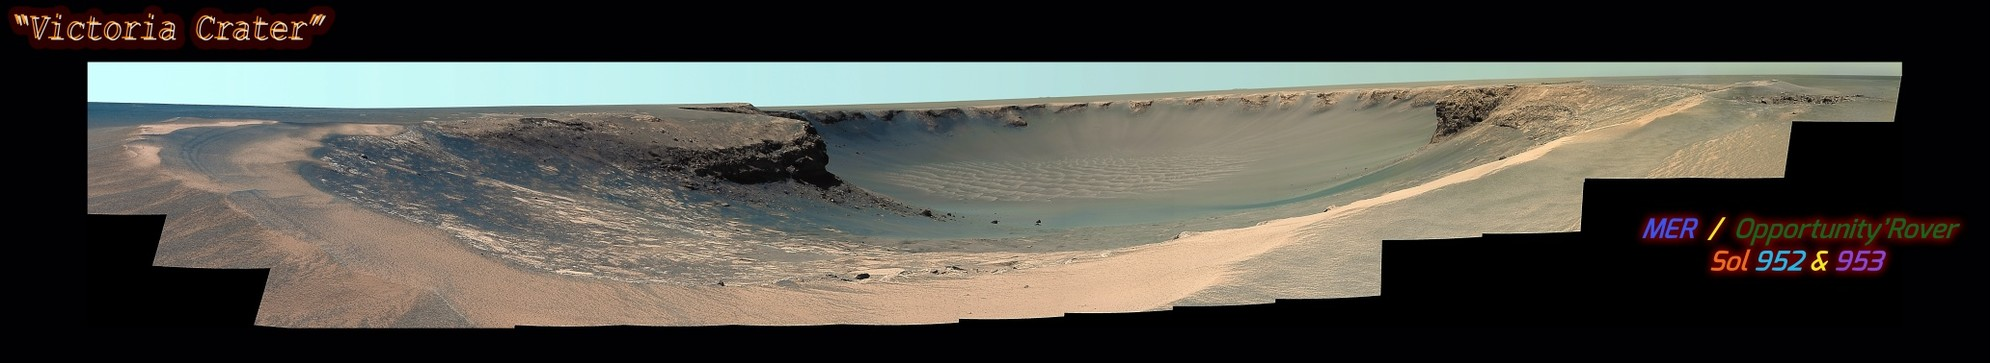 MER Opportunity Rover - Sol(s) 952 & 953